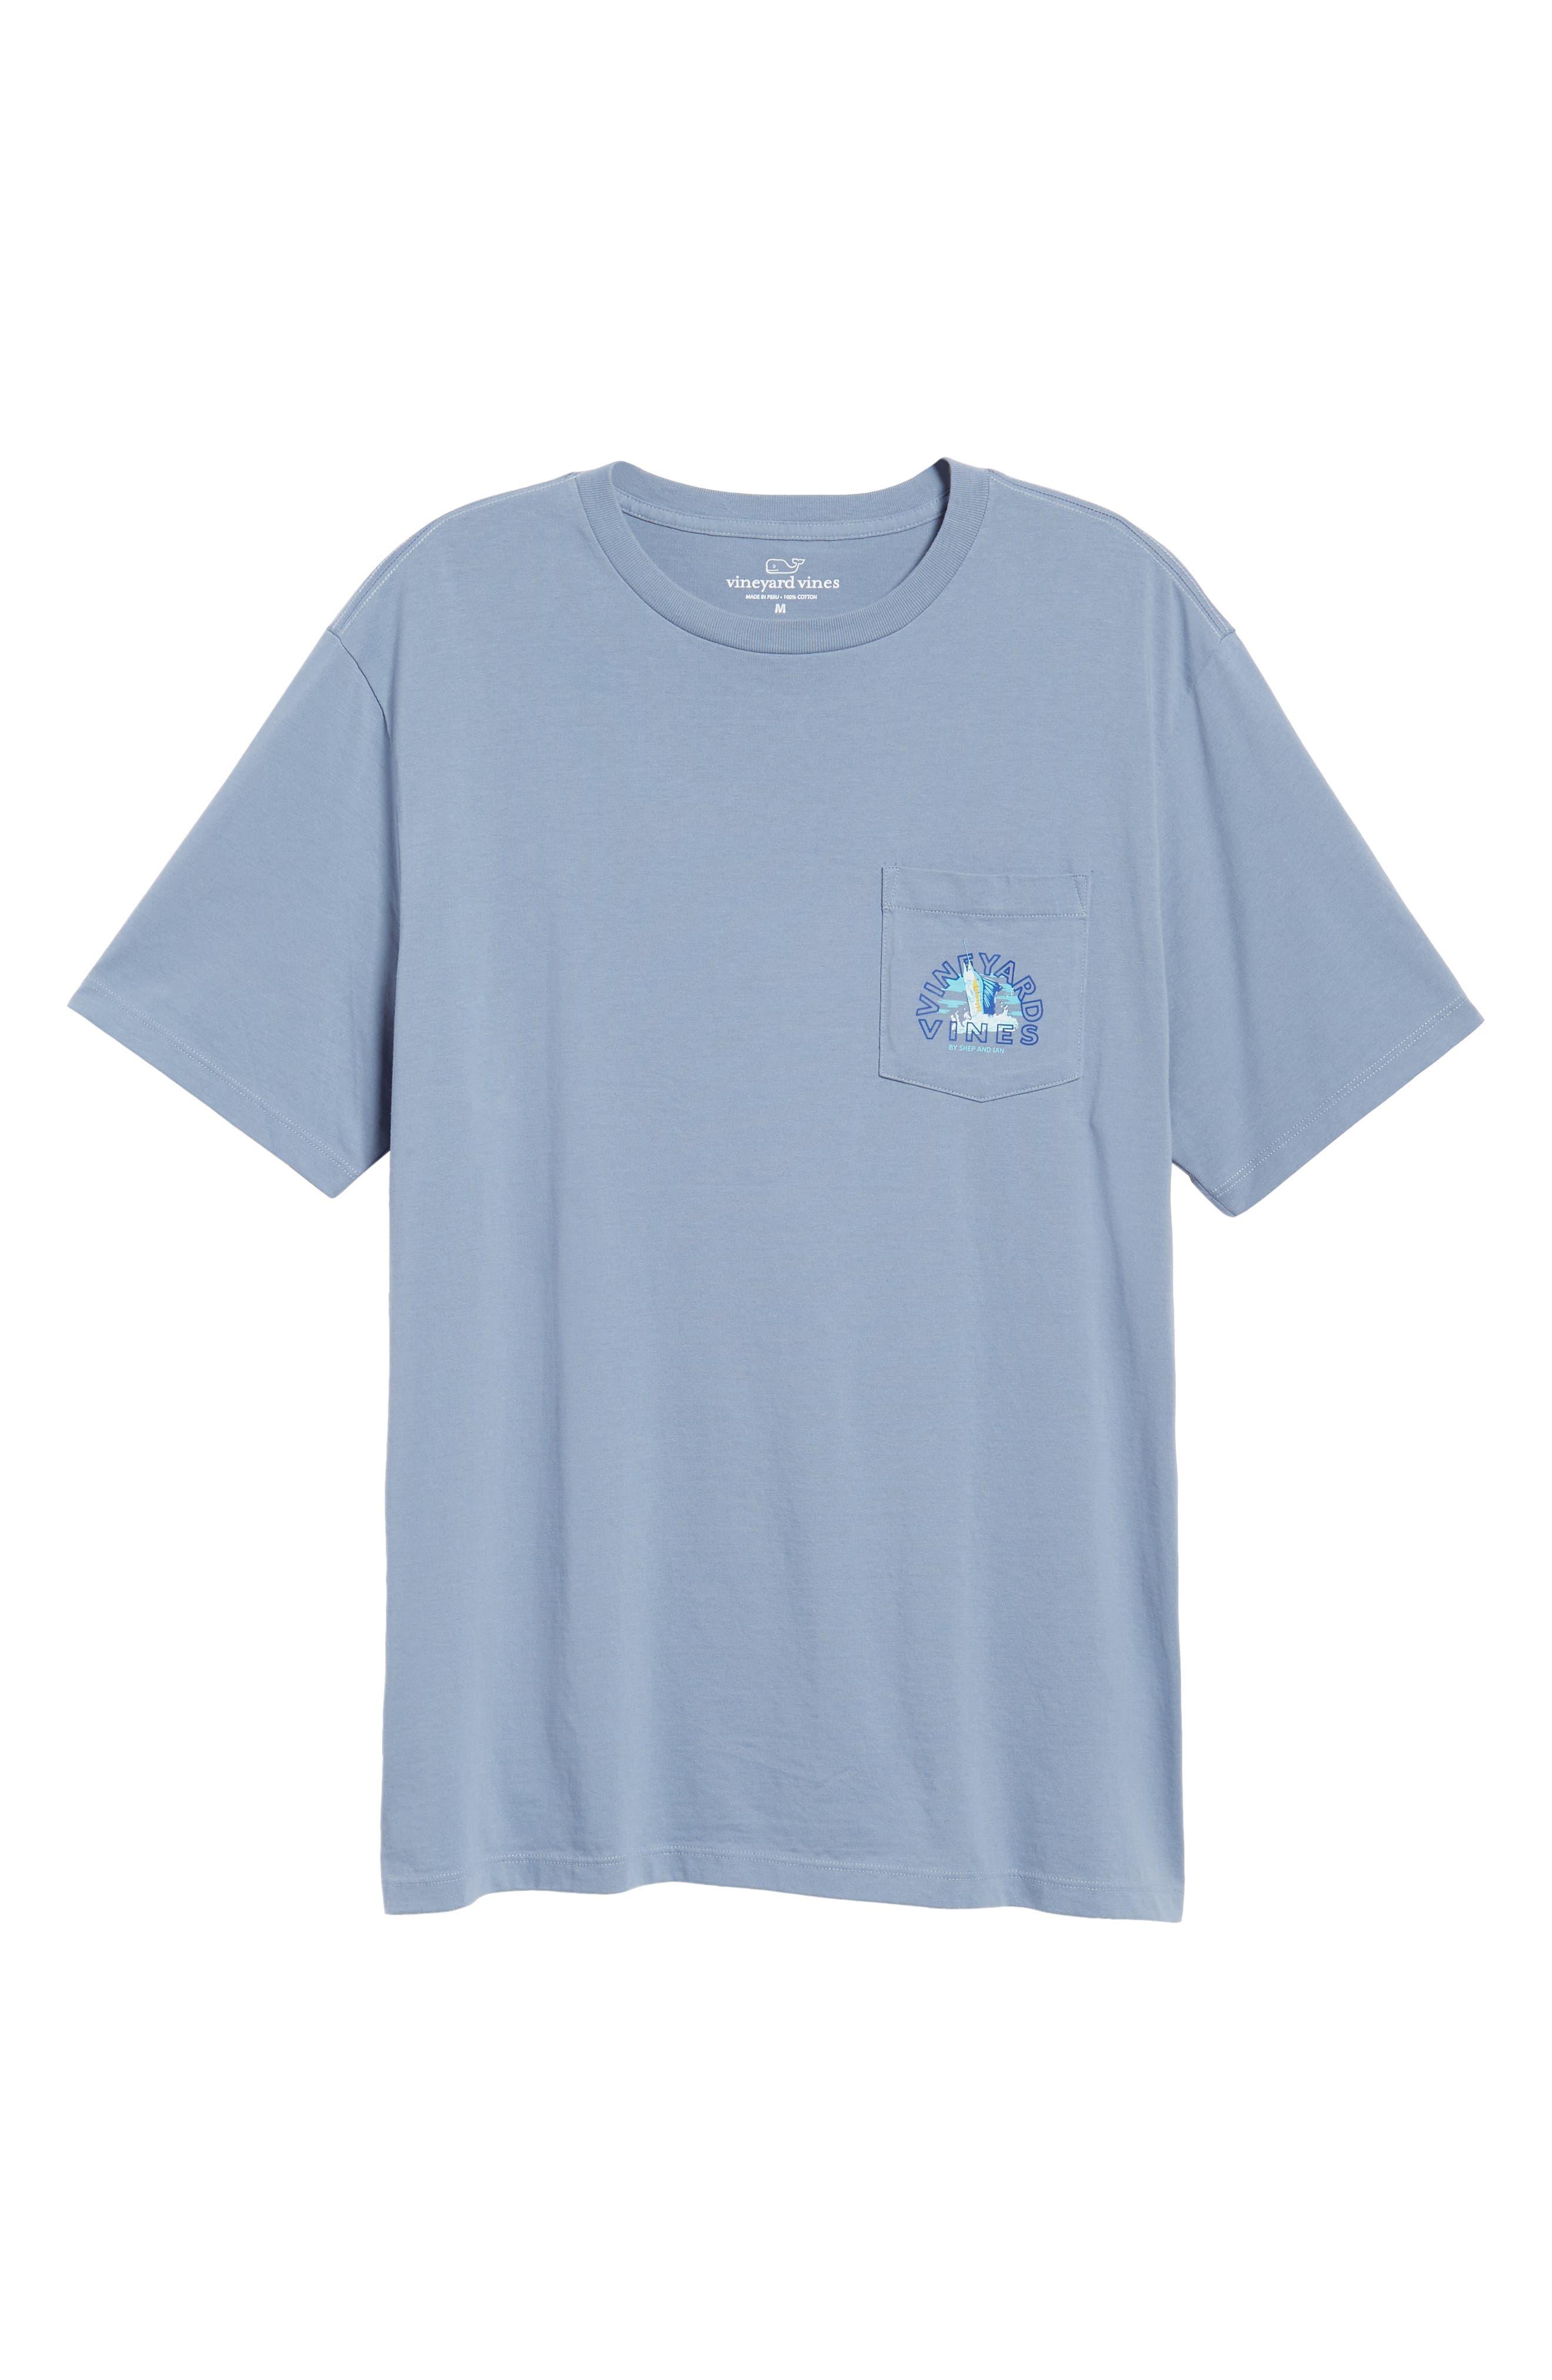 Casting Call Crewneck T-Shirt,                             Alternate thumbnail 6, color,                             411